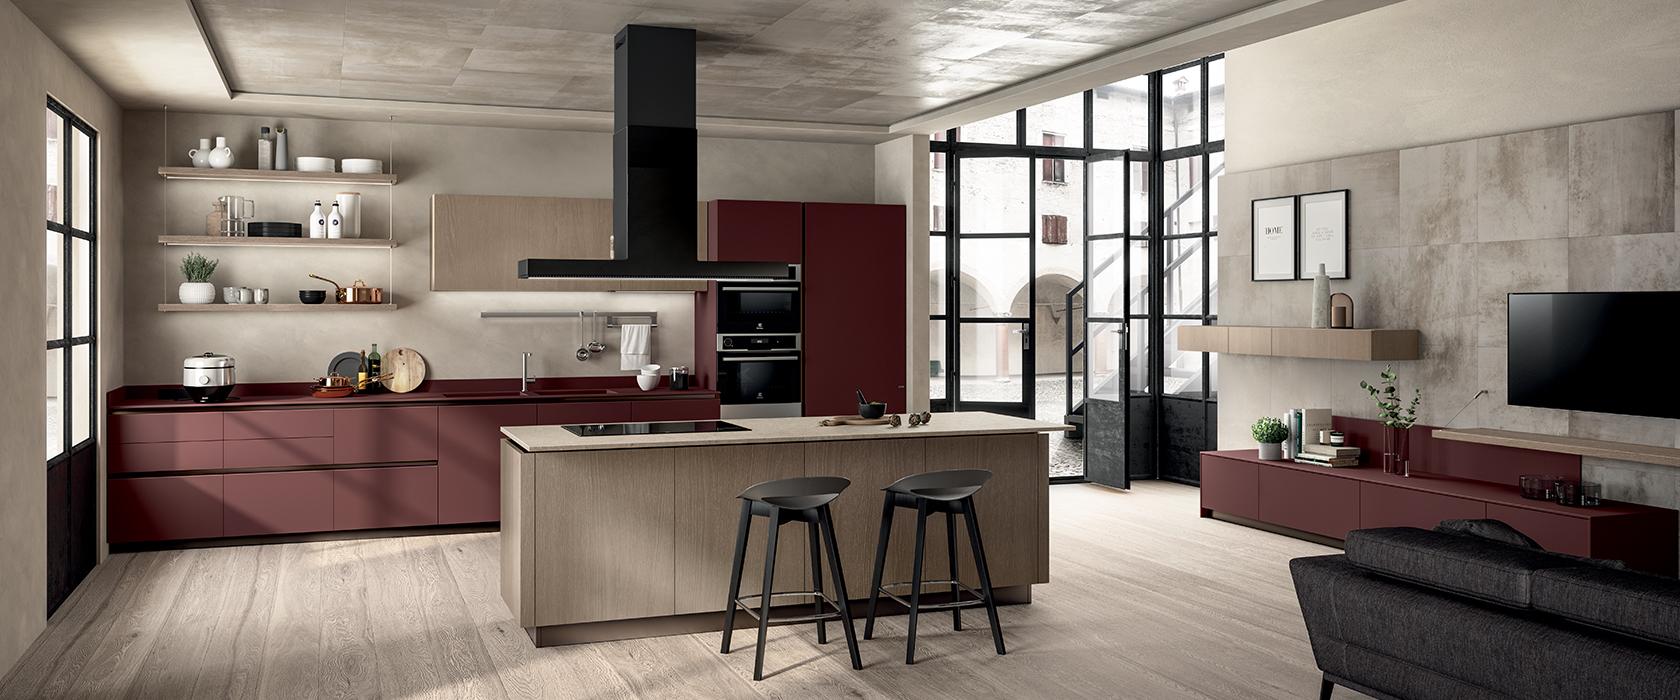 cucina-scavolini-rossa - Centro Mobili